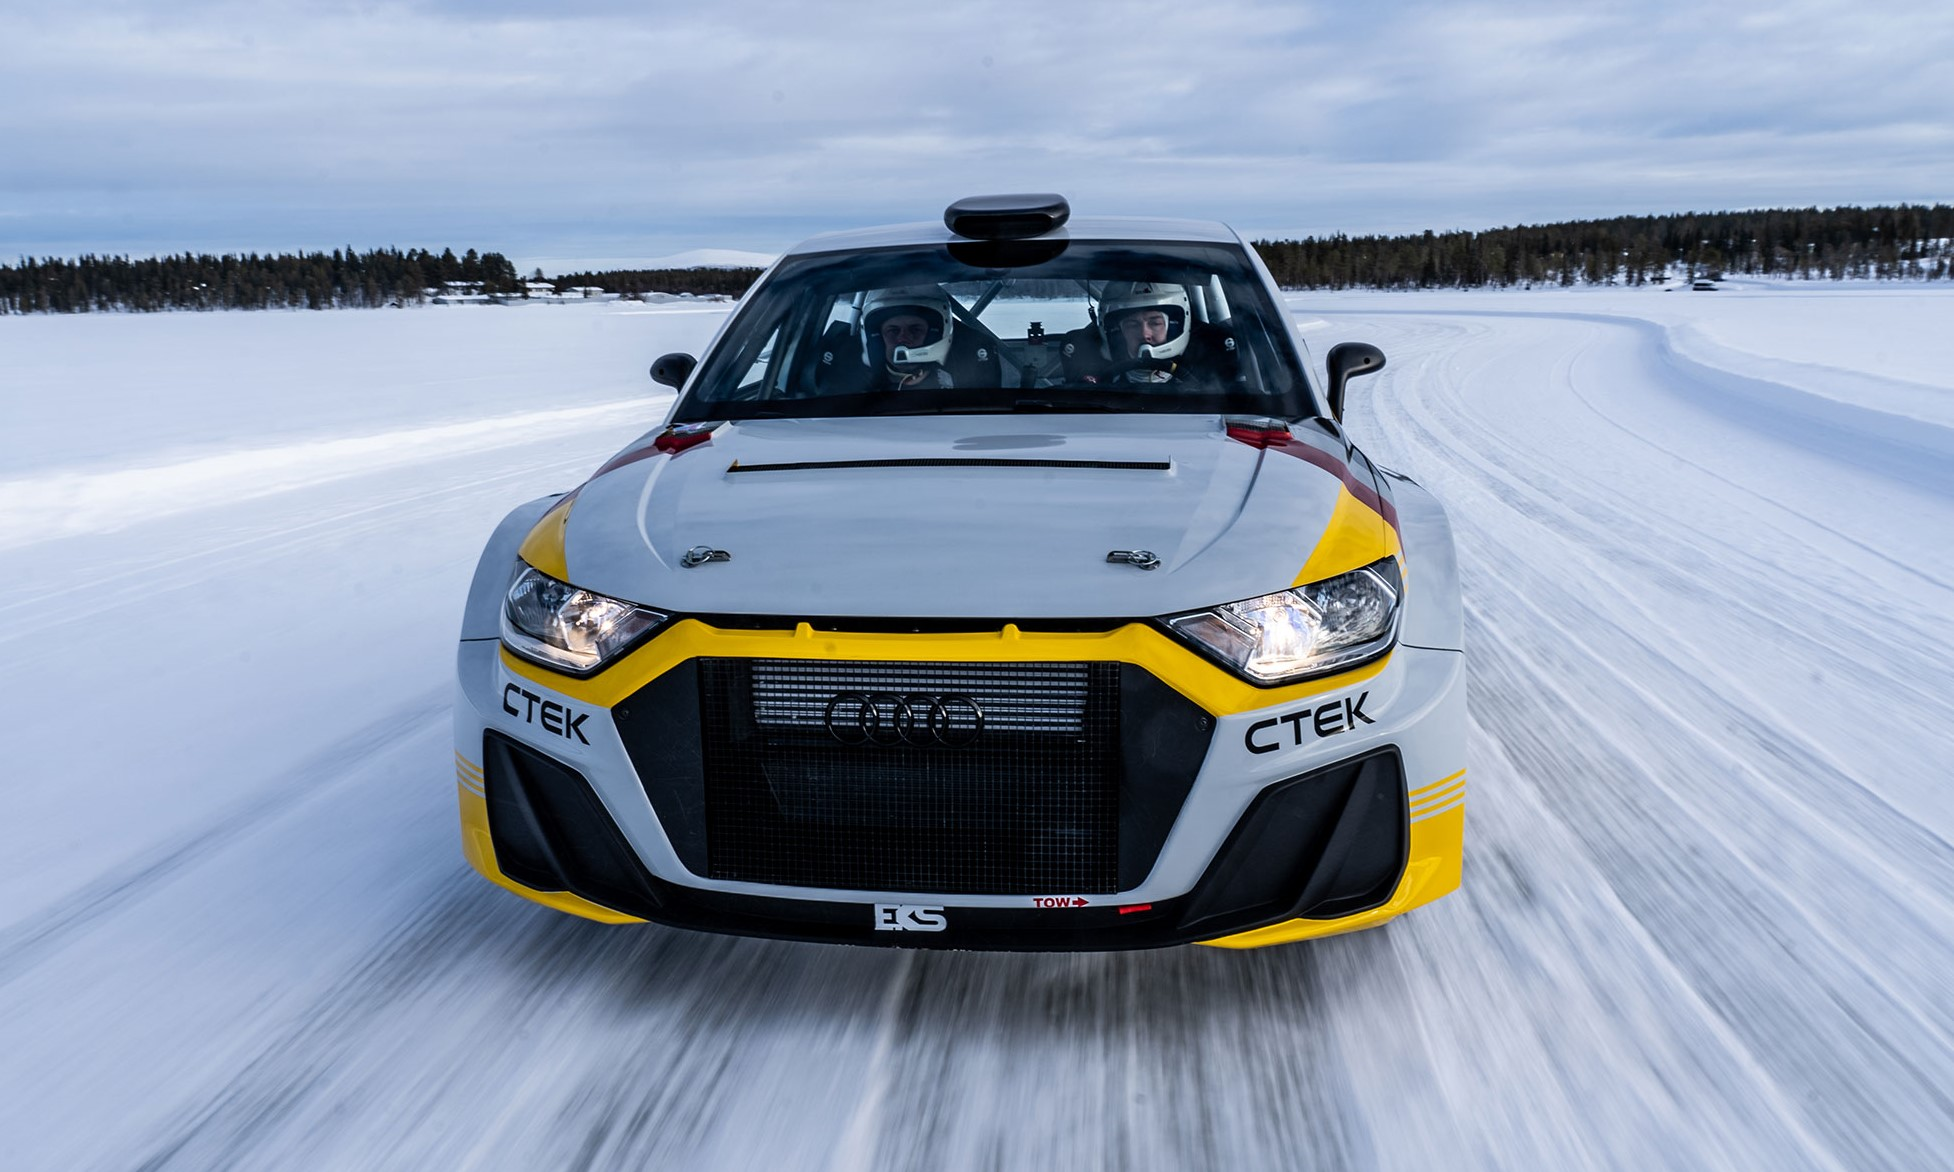 Audi A1 Quattro WRC